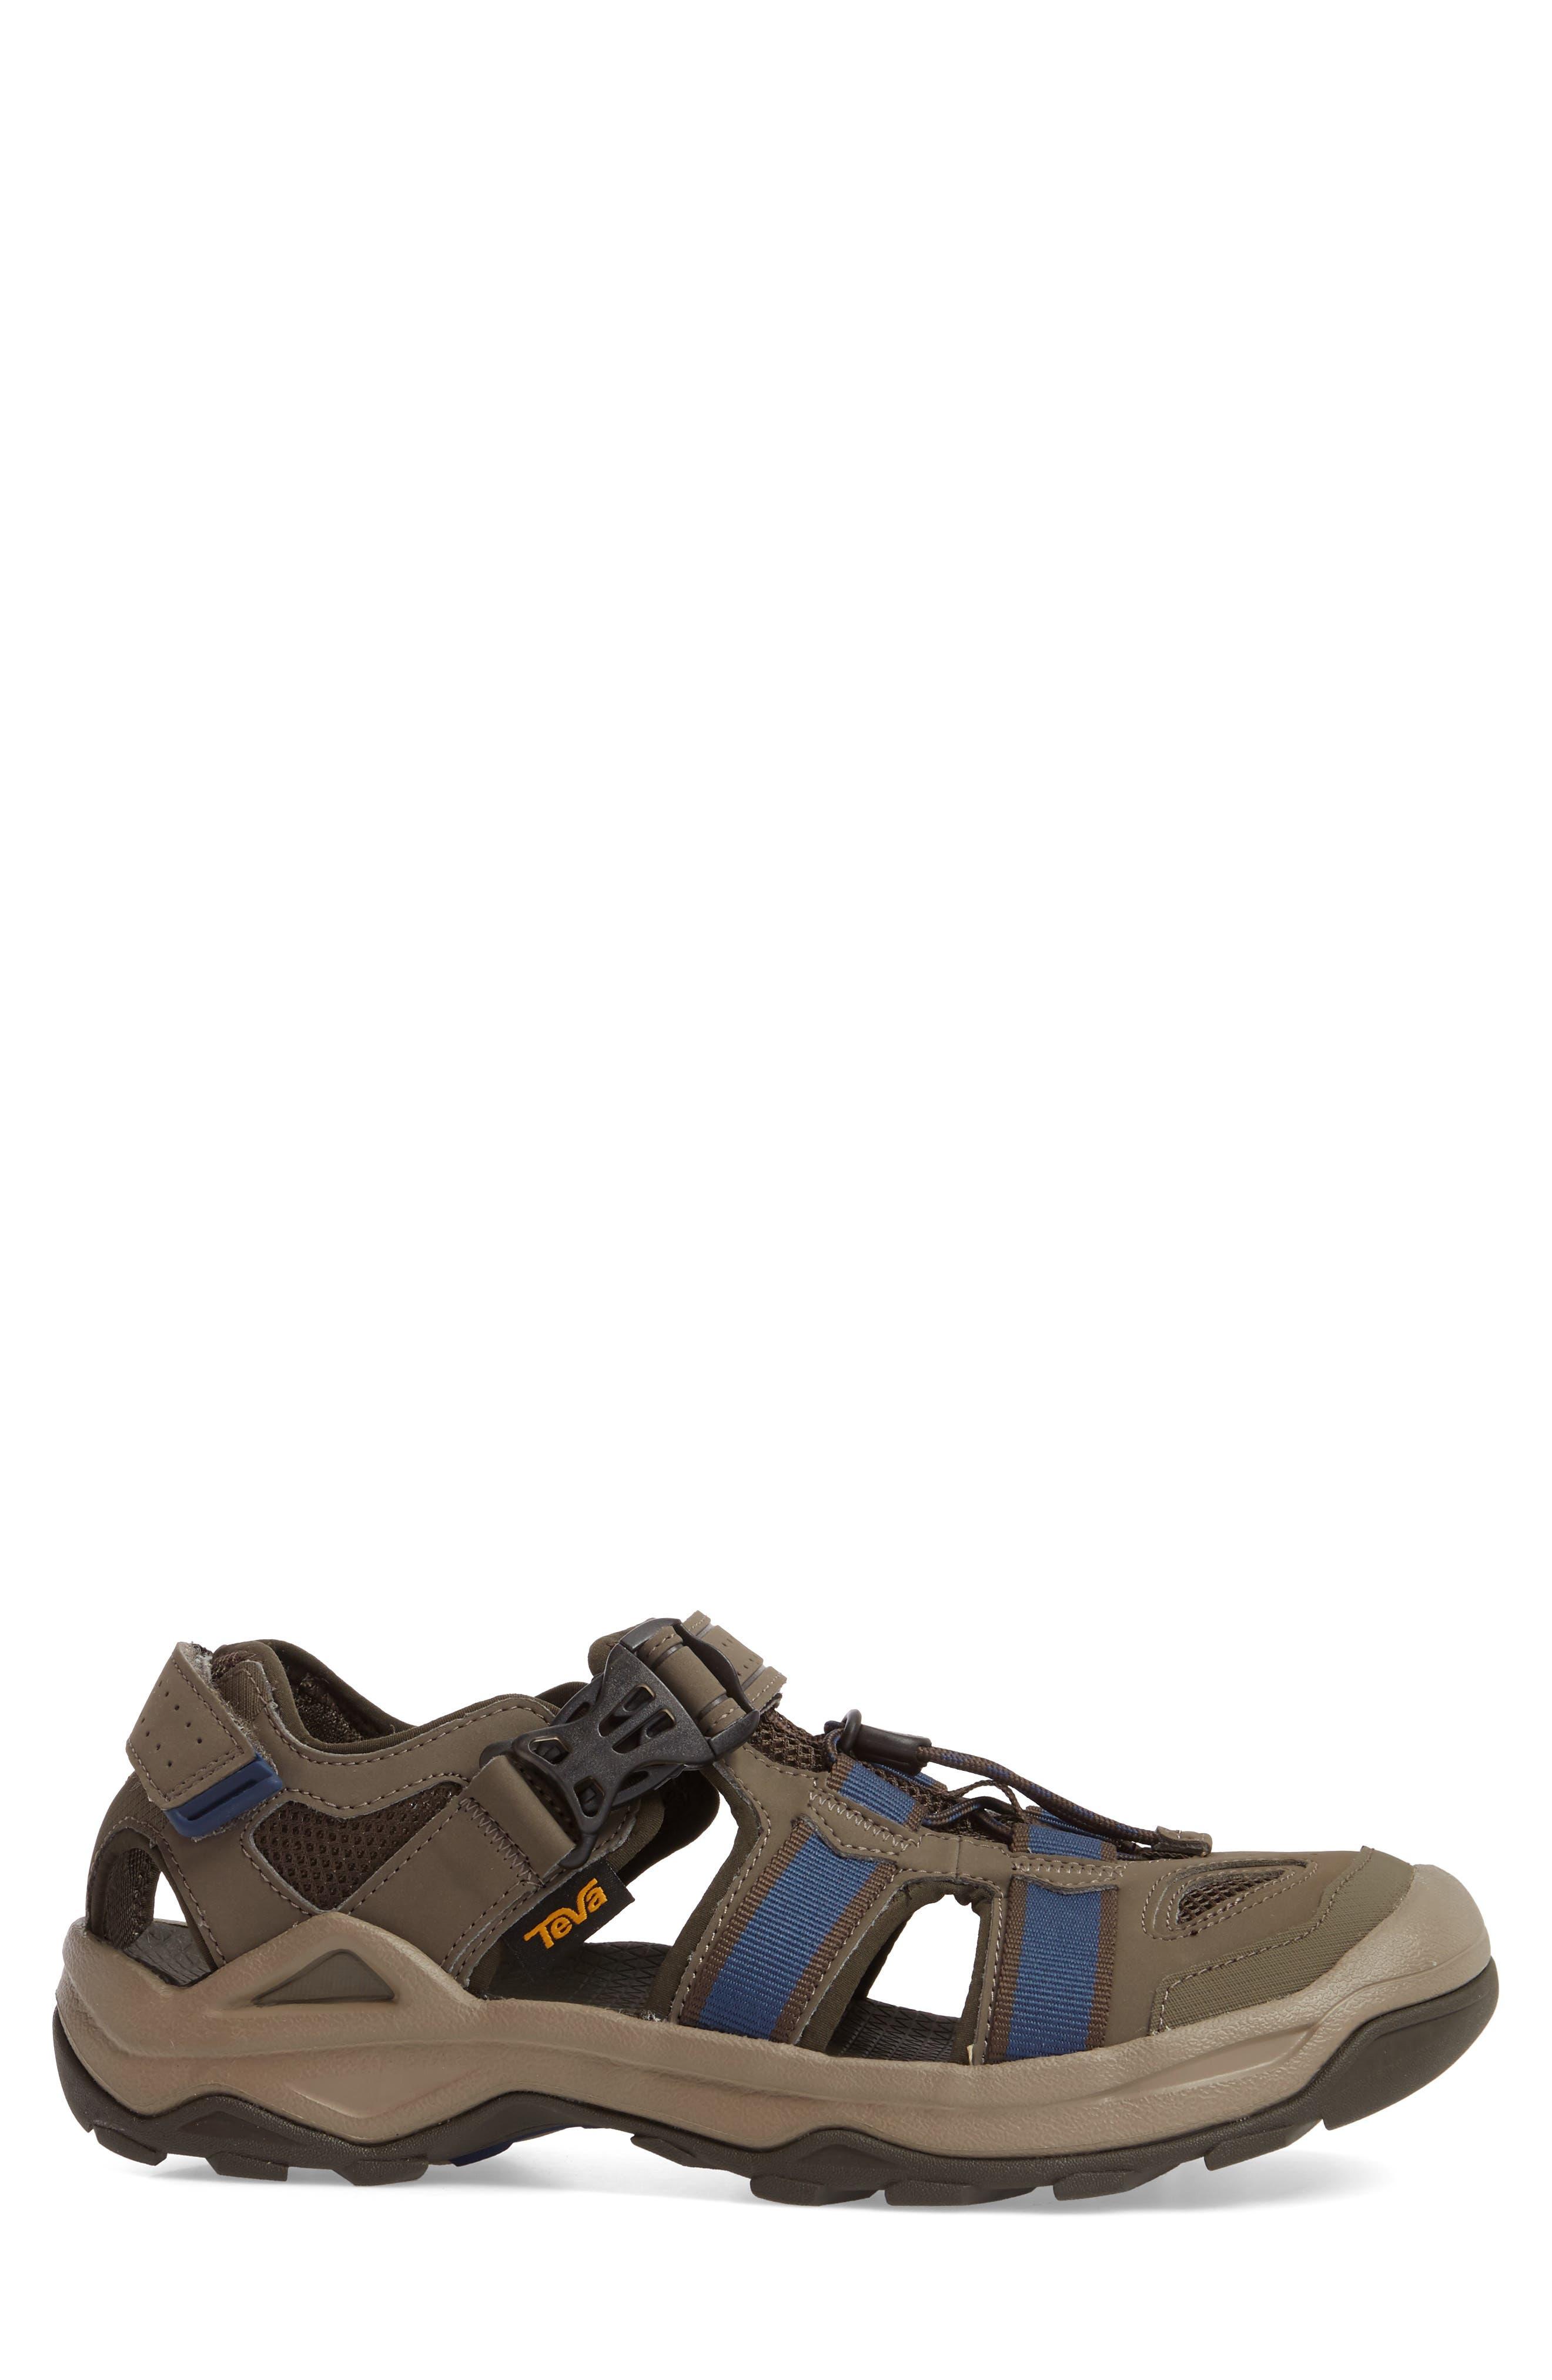 Omnium 2 Hiking Sandal,                             Alternate thumbnail 3, color,                             BROWN NYLON